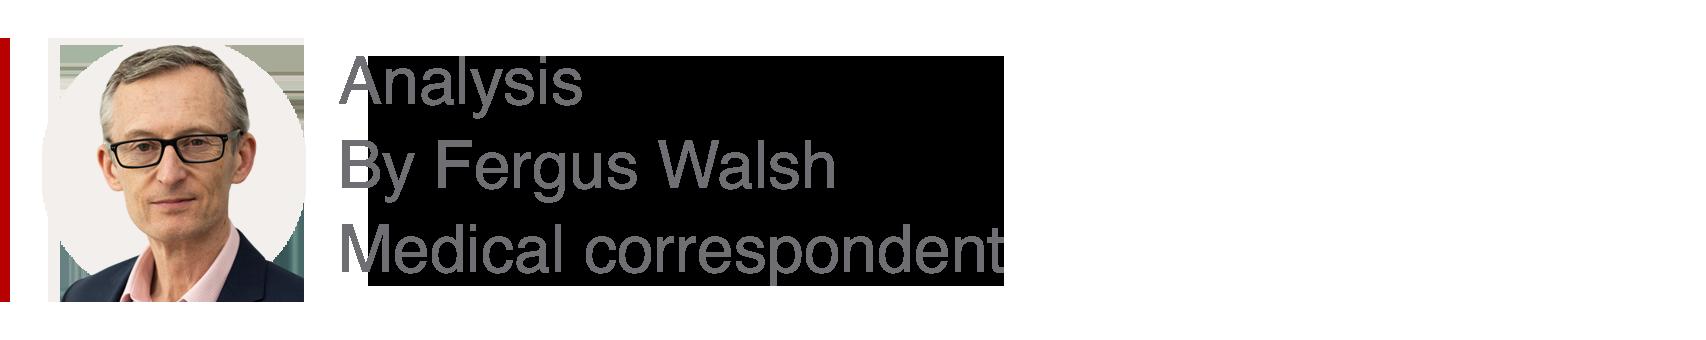 Analysis box by Fergus Walsh, medical correspondent